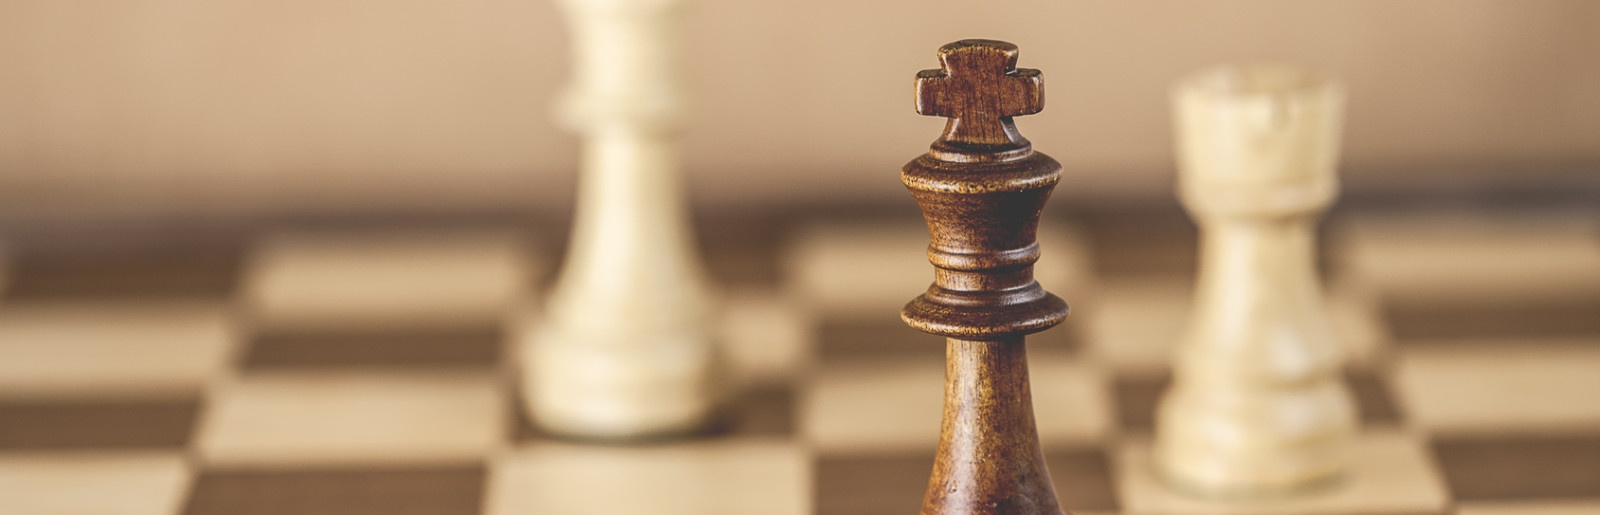 SigFox Vs. LoRa: A Comparison Between Technologies & Business Models